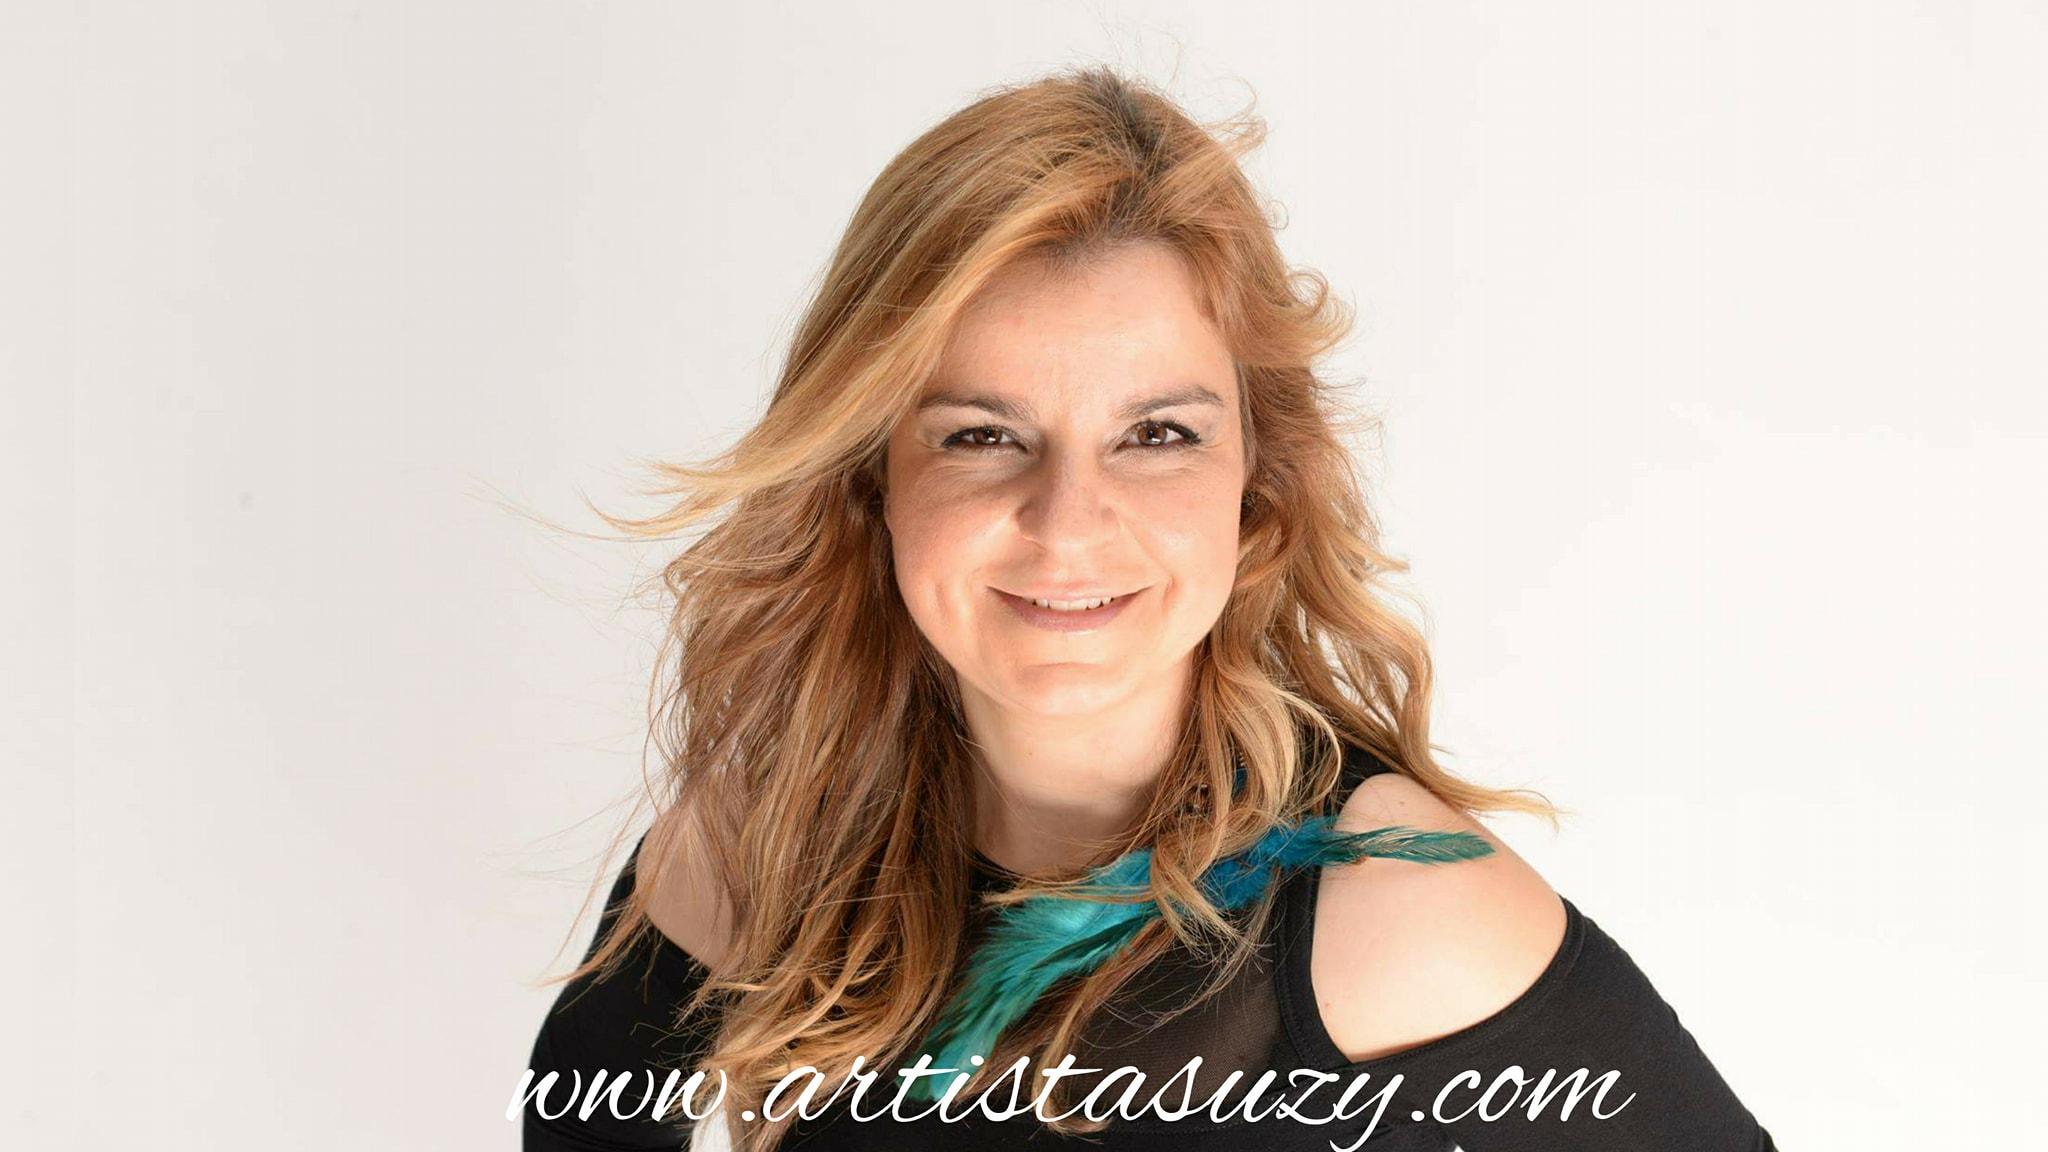 artista Suzy, Cantora, Suzy, Musica Portuguesa, Musica Popular, Artistas Portuguesas, Cantoras populares